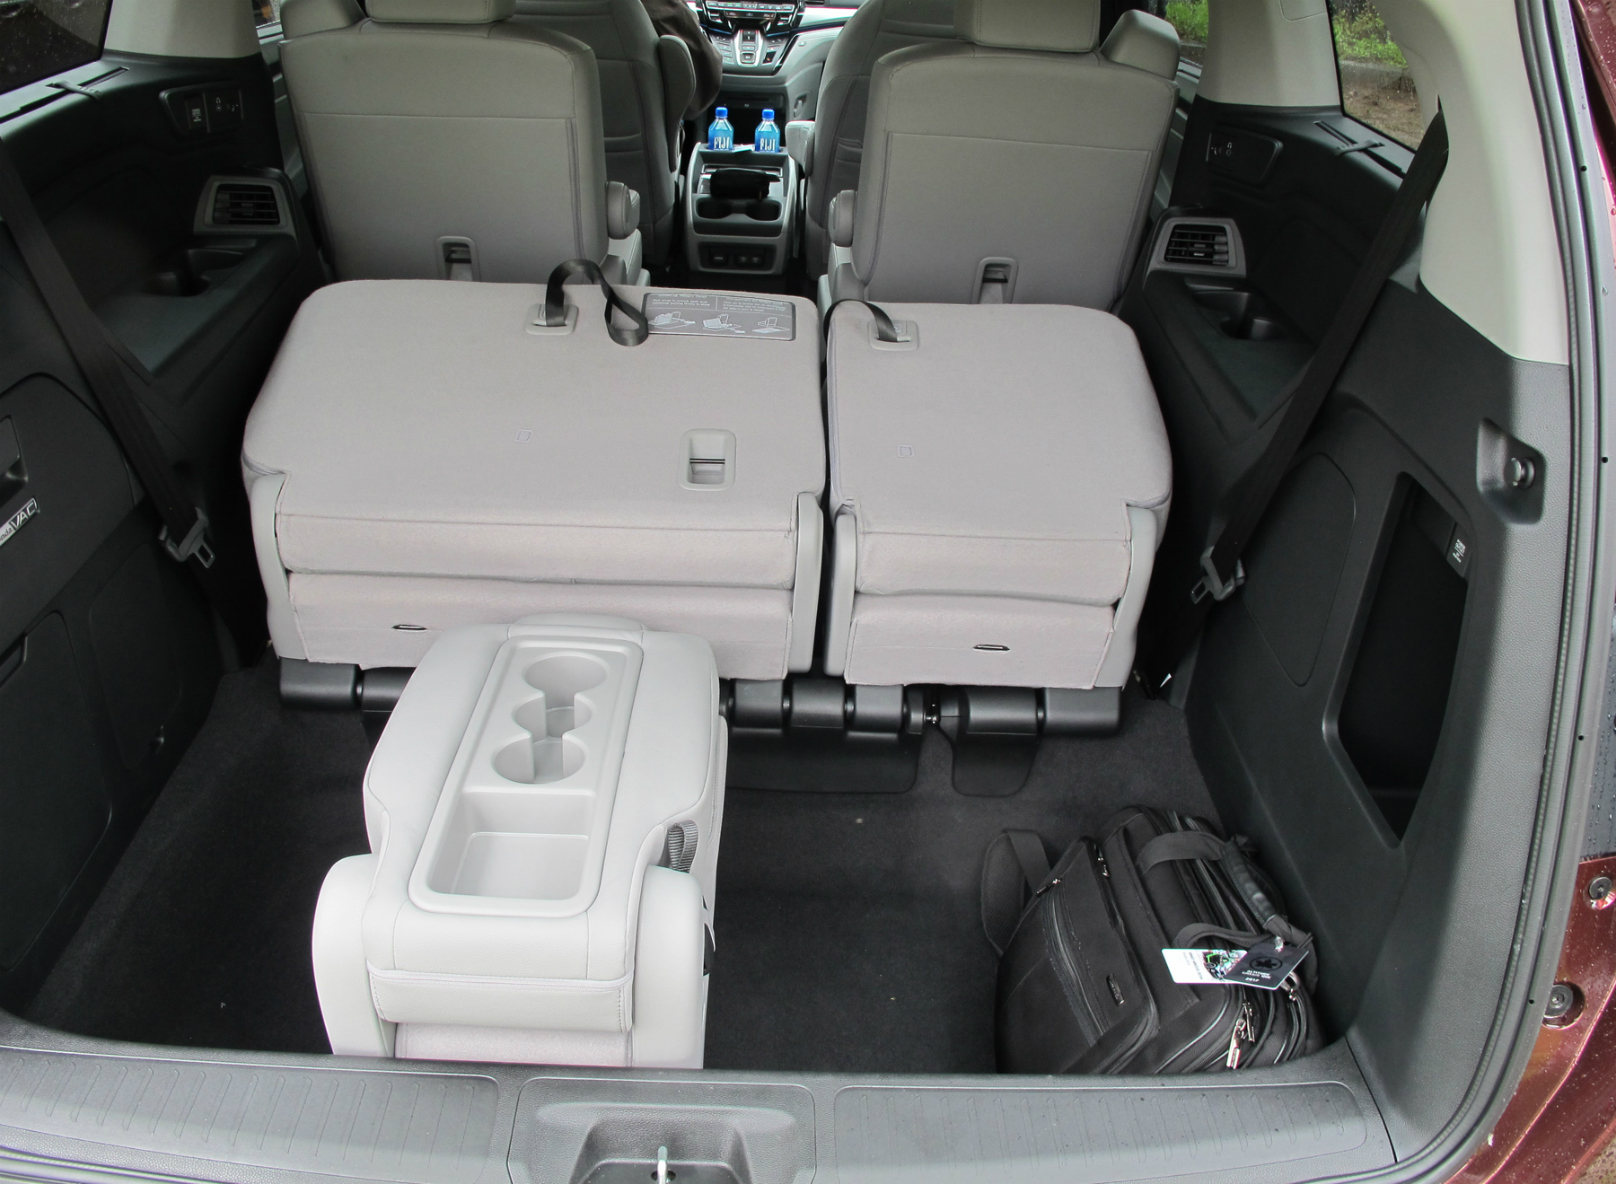 Honda Enhances Segment Leading Odyssey Minivan - WHEELS.ca